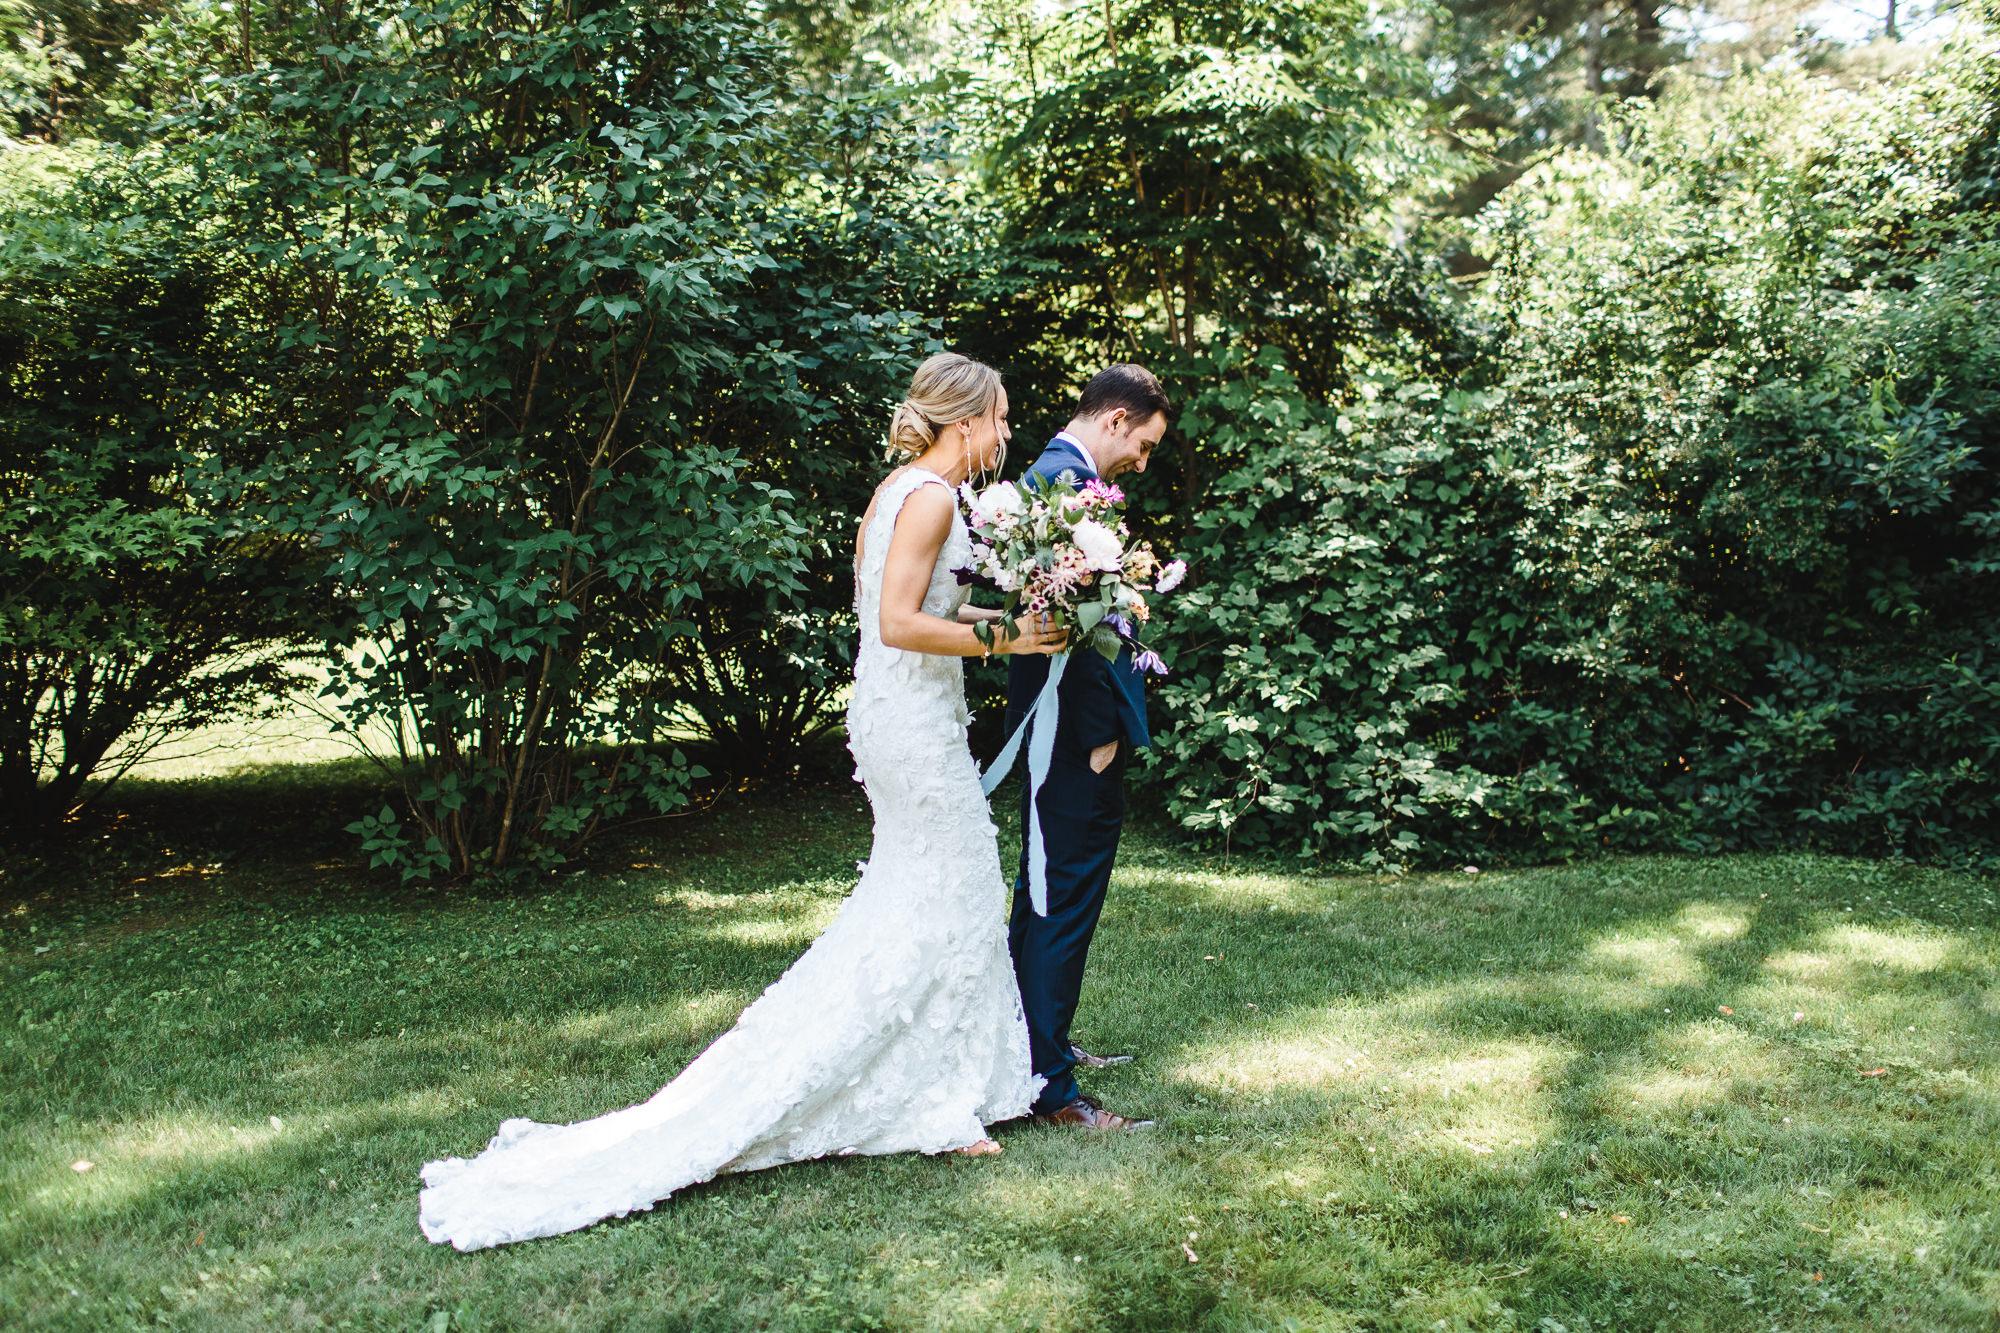 connecticut-summer-lake-wedding-emily-kirke-photography-upstyle (36 of 181).jpg